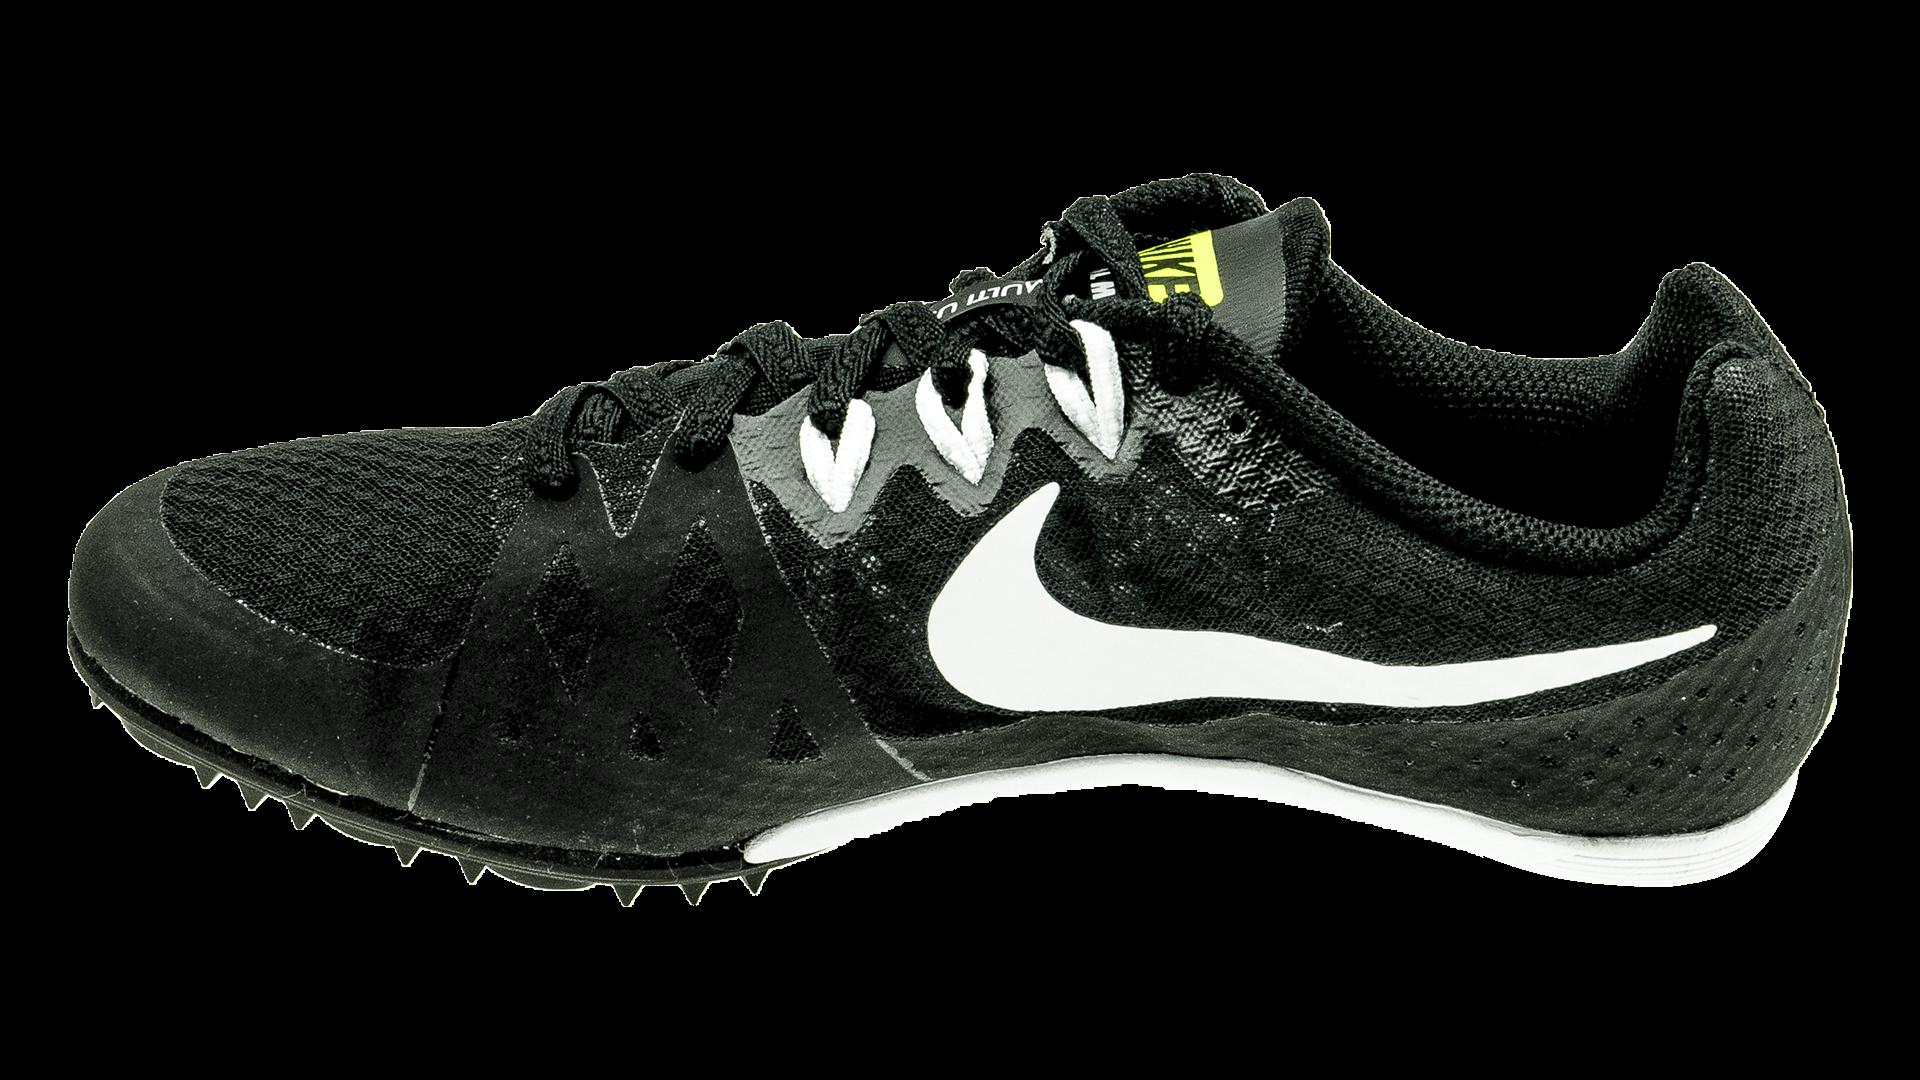 new product 7f21c 97521 NikeZoom Rival M8 black white  unisex